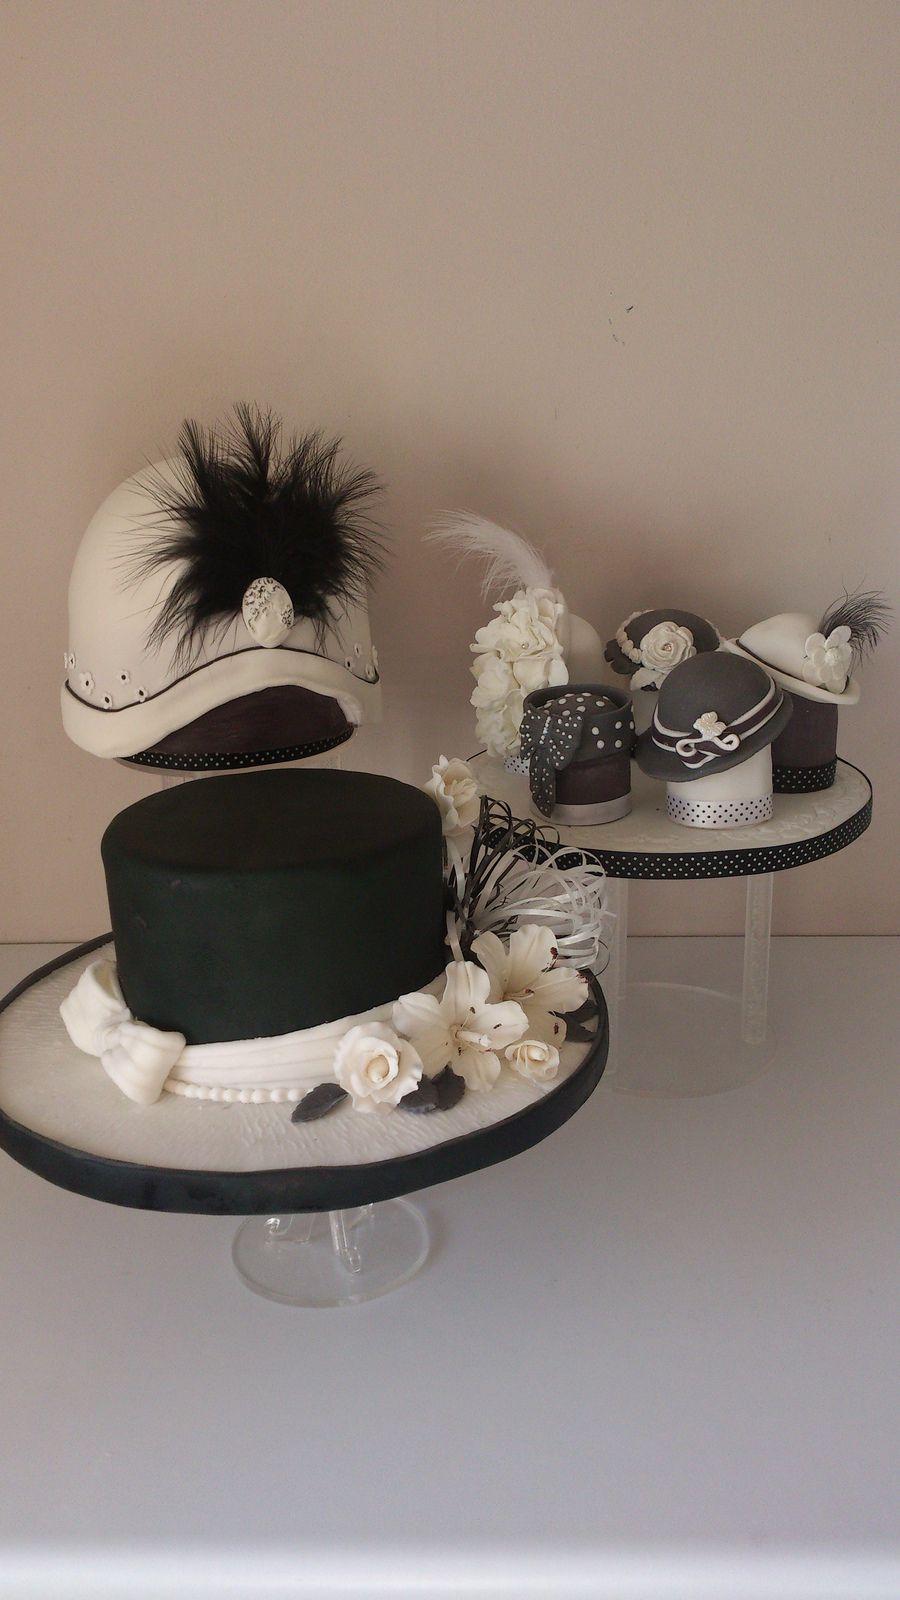 My Fair Lady Hats Fashion сakes Birthday Cakes For